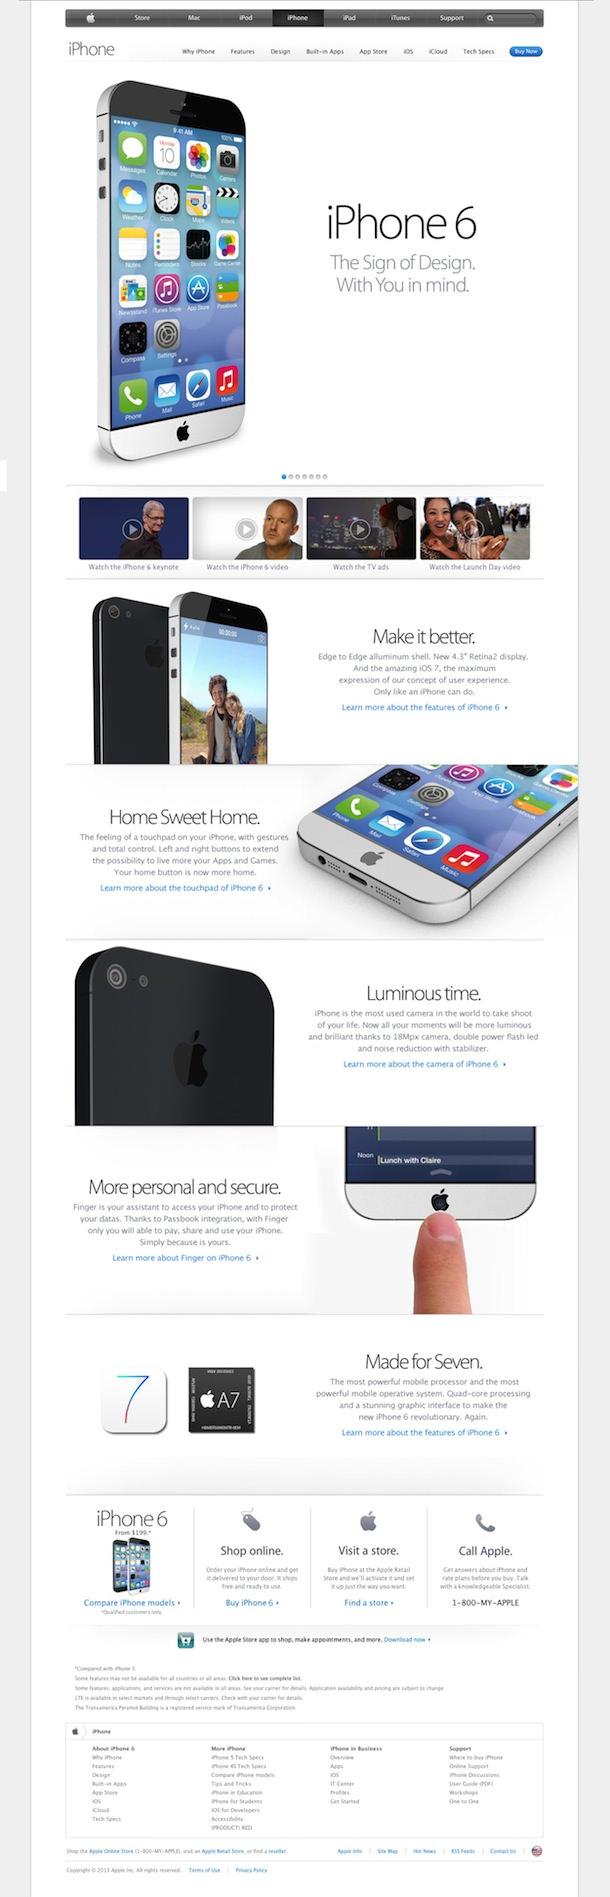 iphone6+7